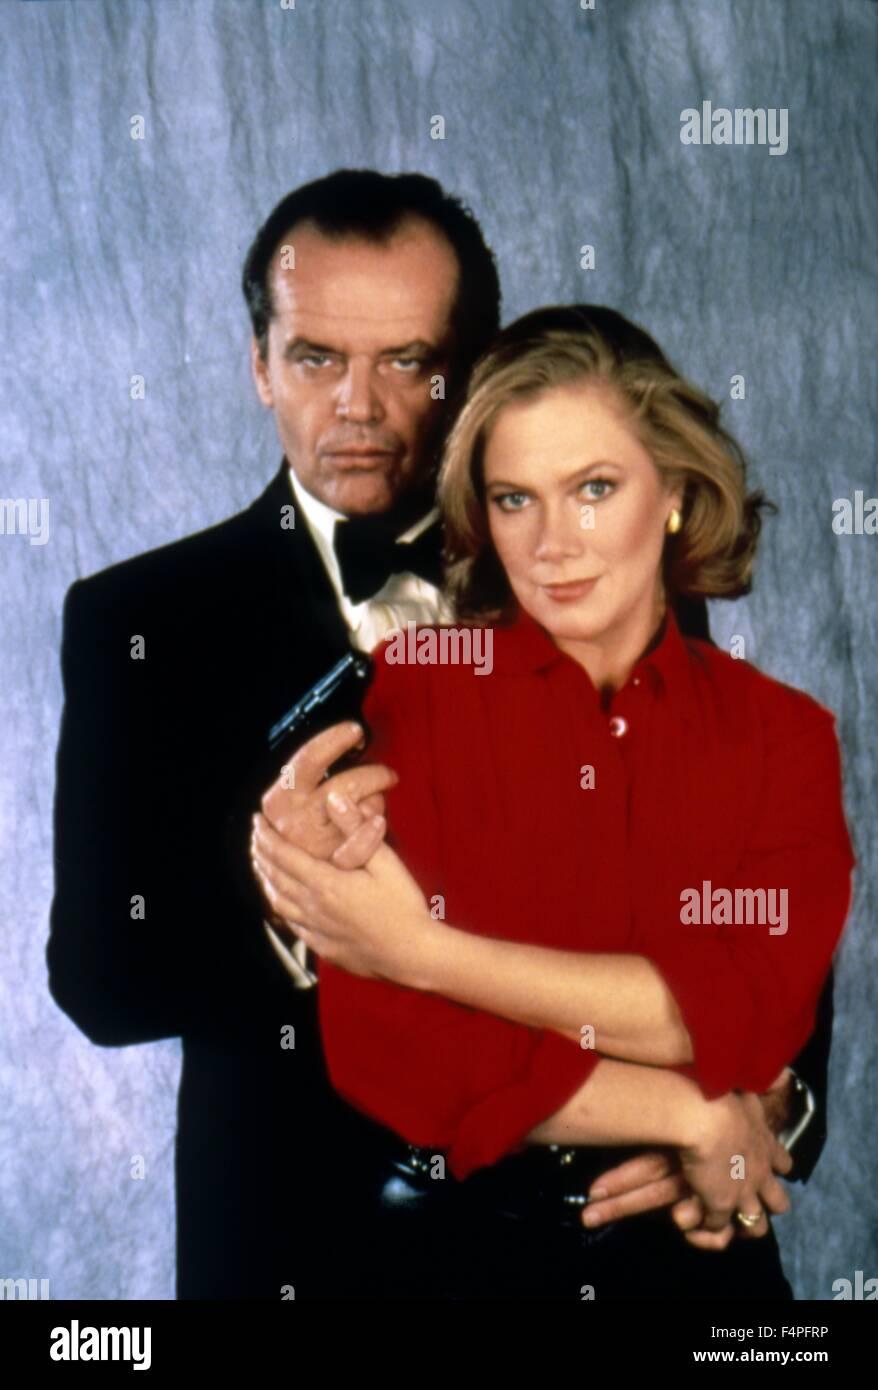 Jack Nicholson and Kathleen Turner / Prizzi's Honor / 1985 directed by John Huston - Stock Image